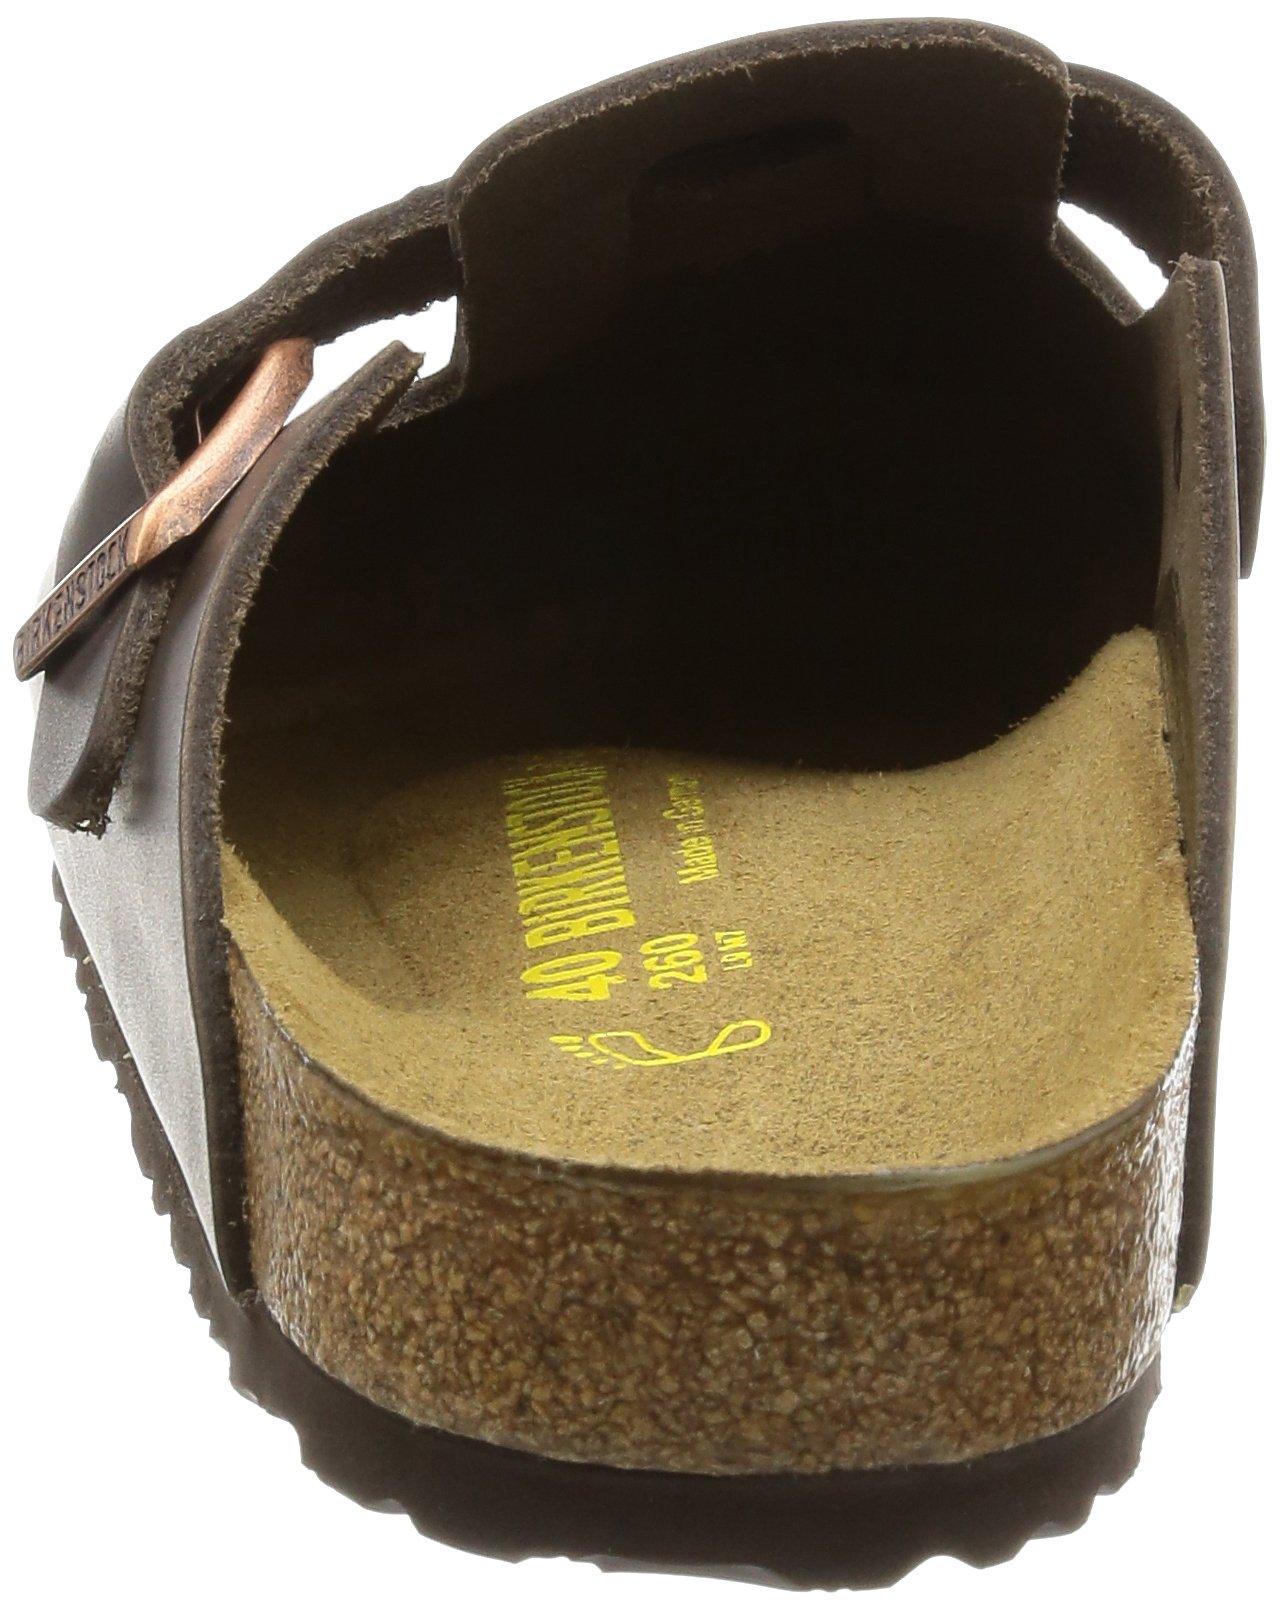 Birkenstock Boston, Unisex Adults' Clogs, Dark Brown Leather,8 UK by Birkenstock (Image #2)